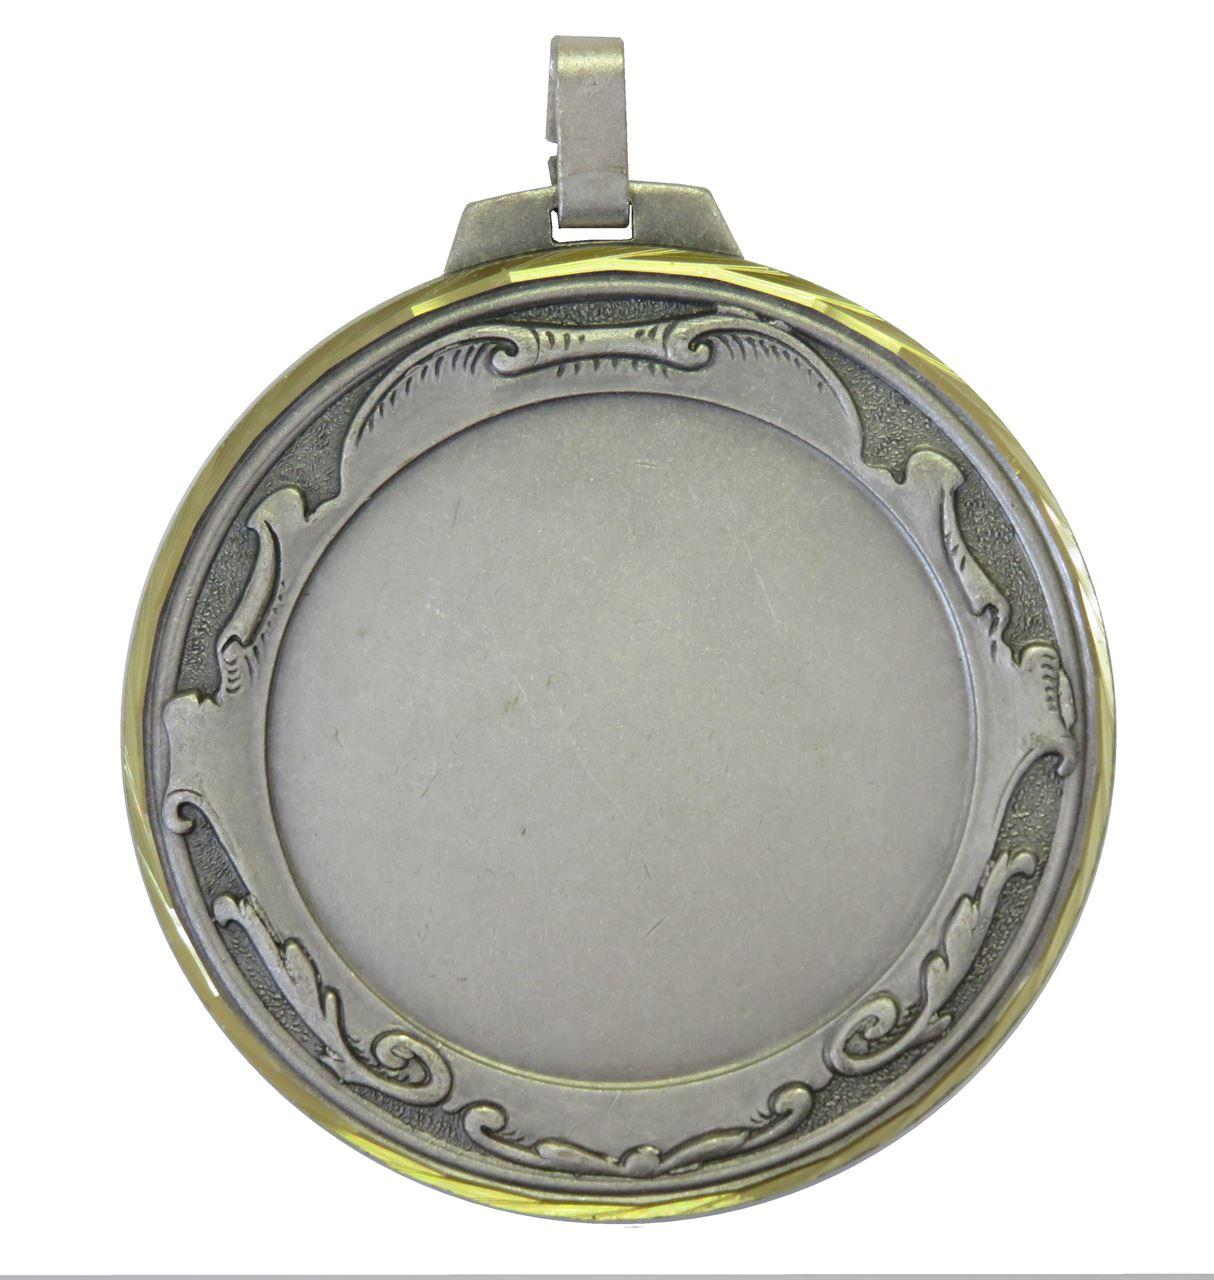 Silver Faceted Royal Medal (size: 70mm) - 6005FL